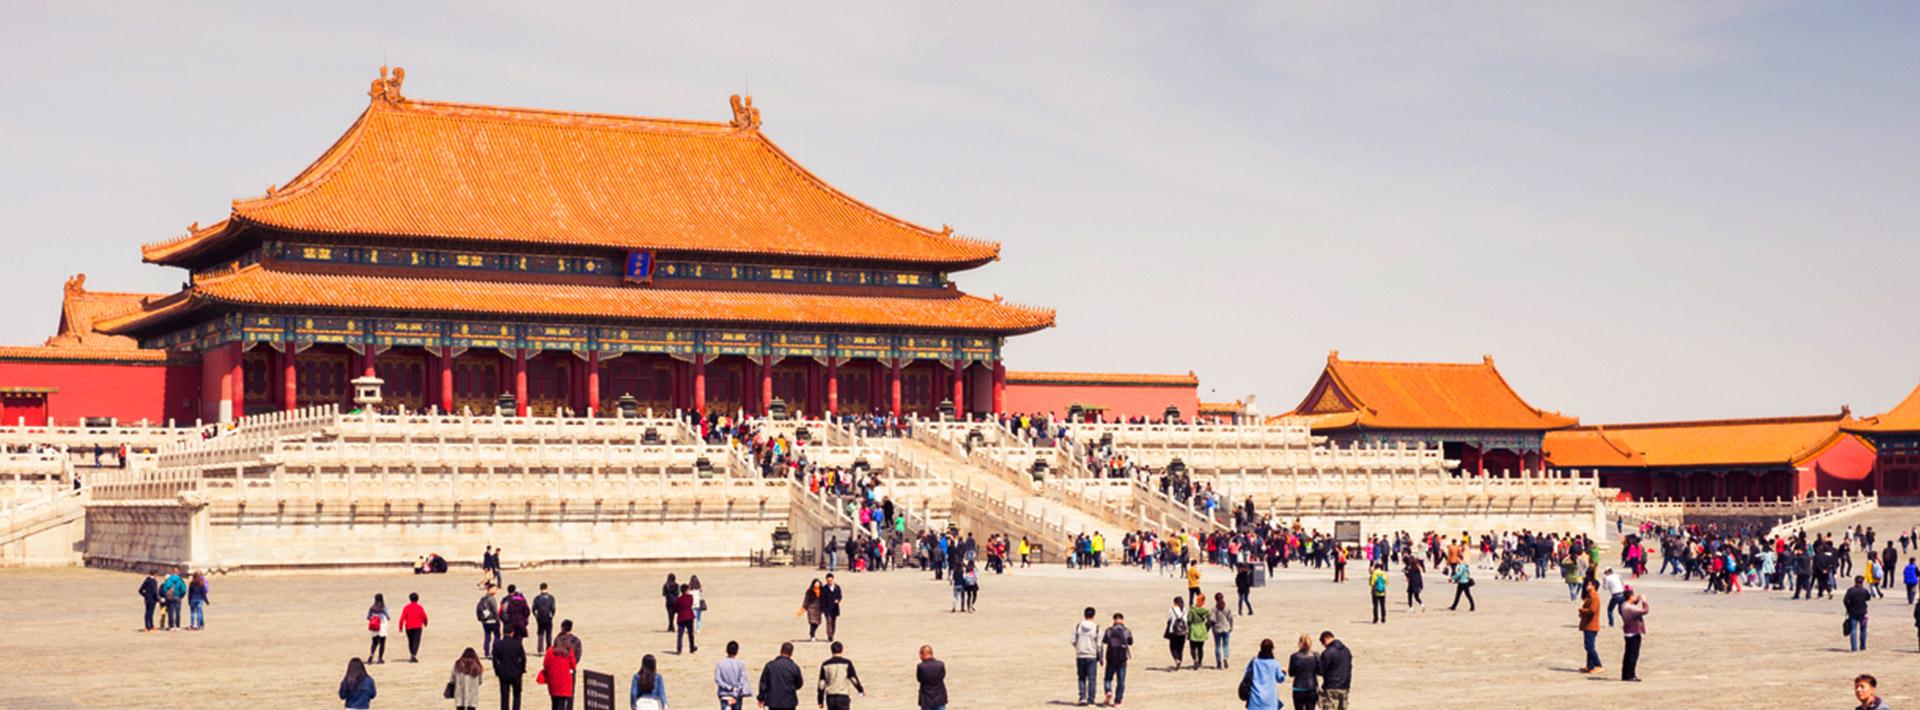 W-Hotels_Article_1920x710_Beijing-Insider-Tour